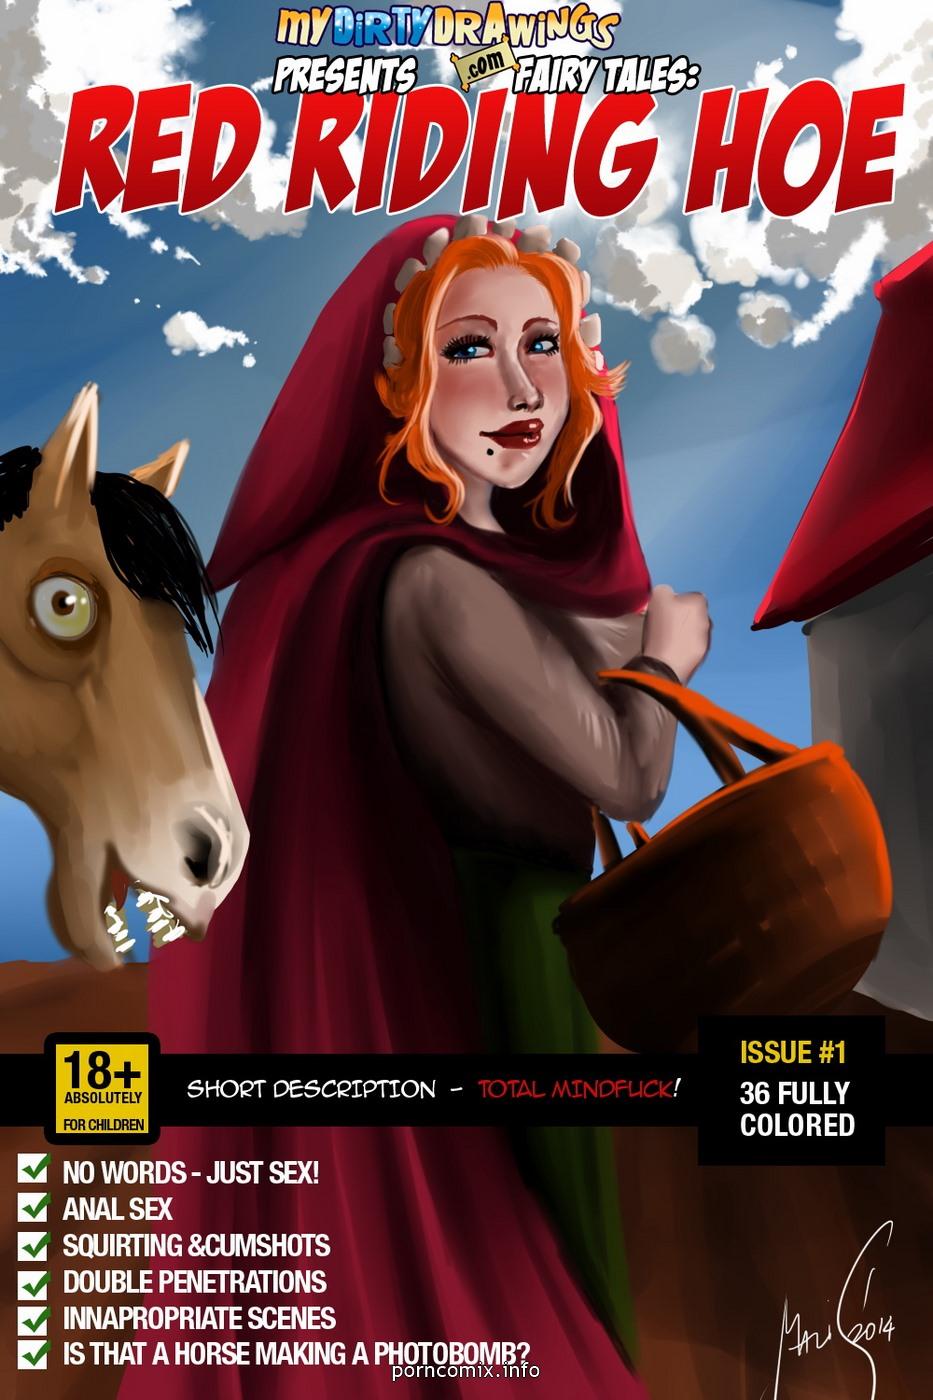 Mavruda – Red Riding Hoe image 01